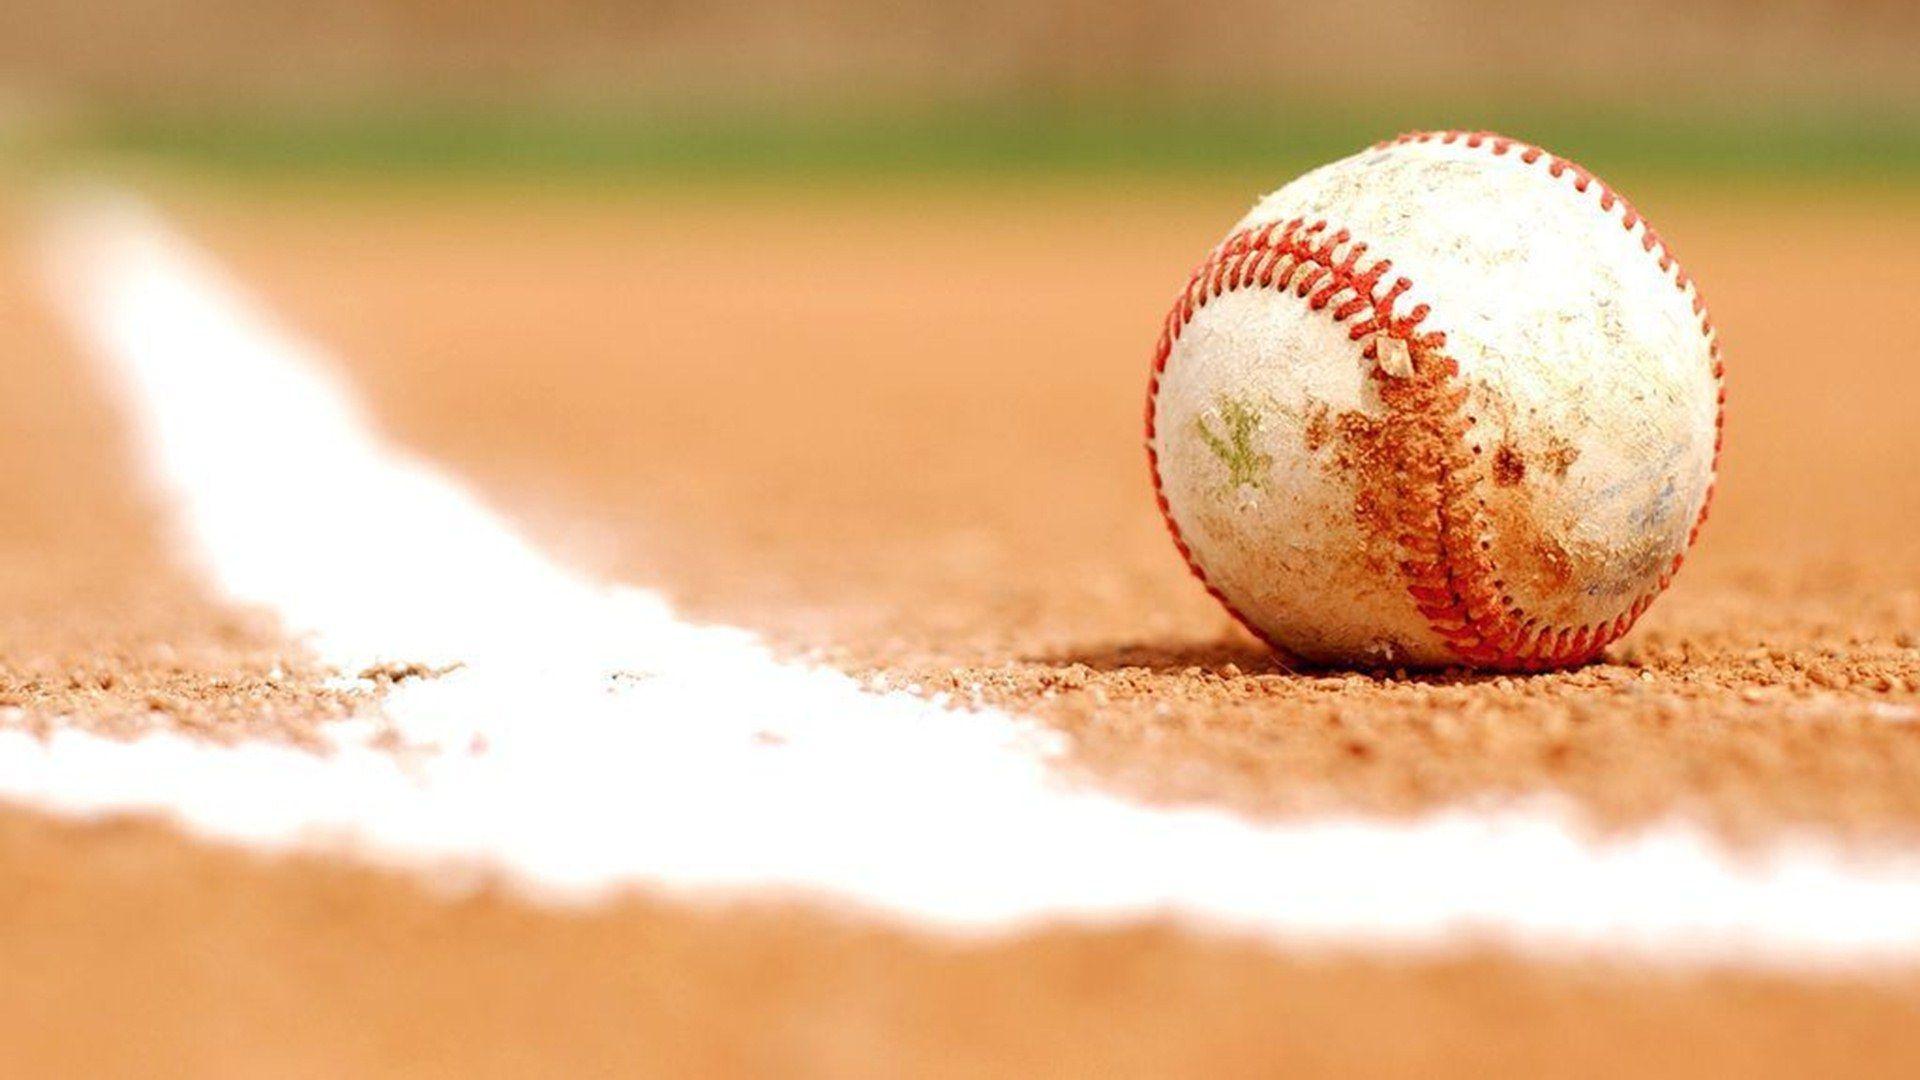 Baseball HD Wallpaper Facebook timeline covers, Baseball